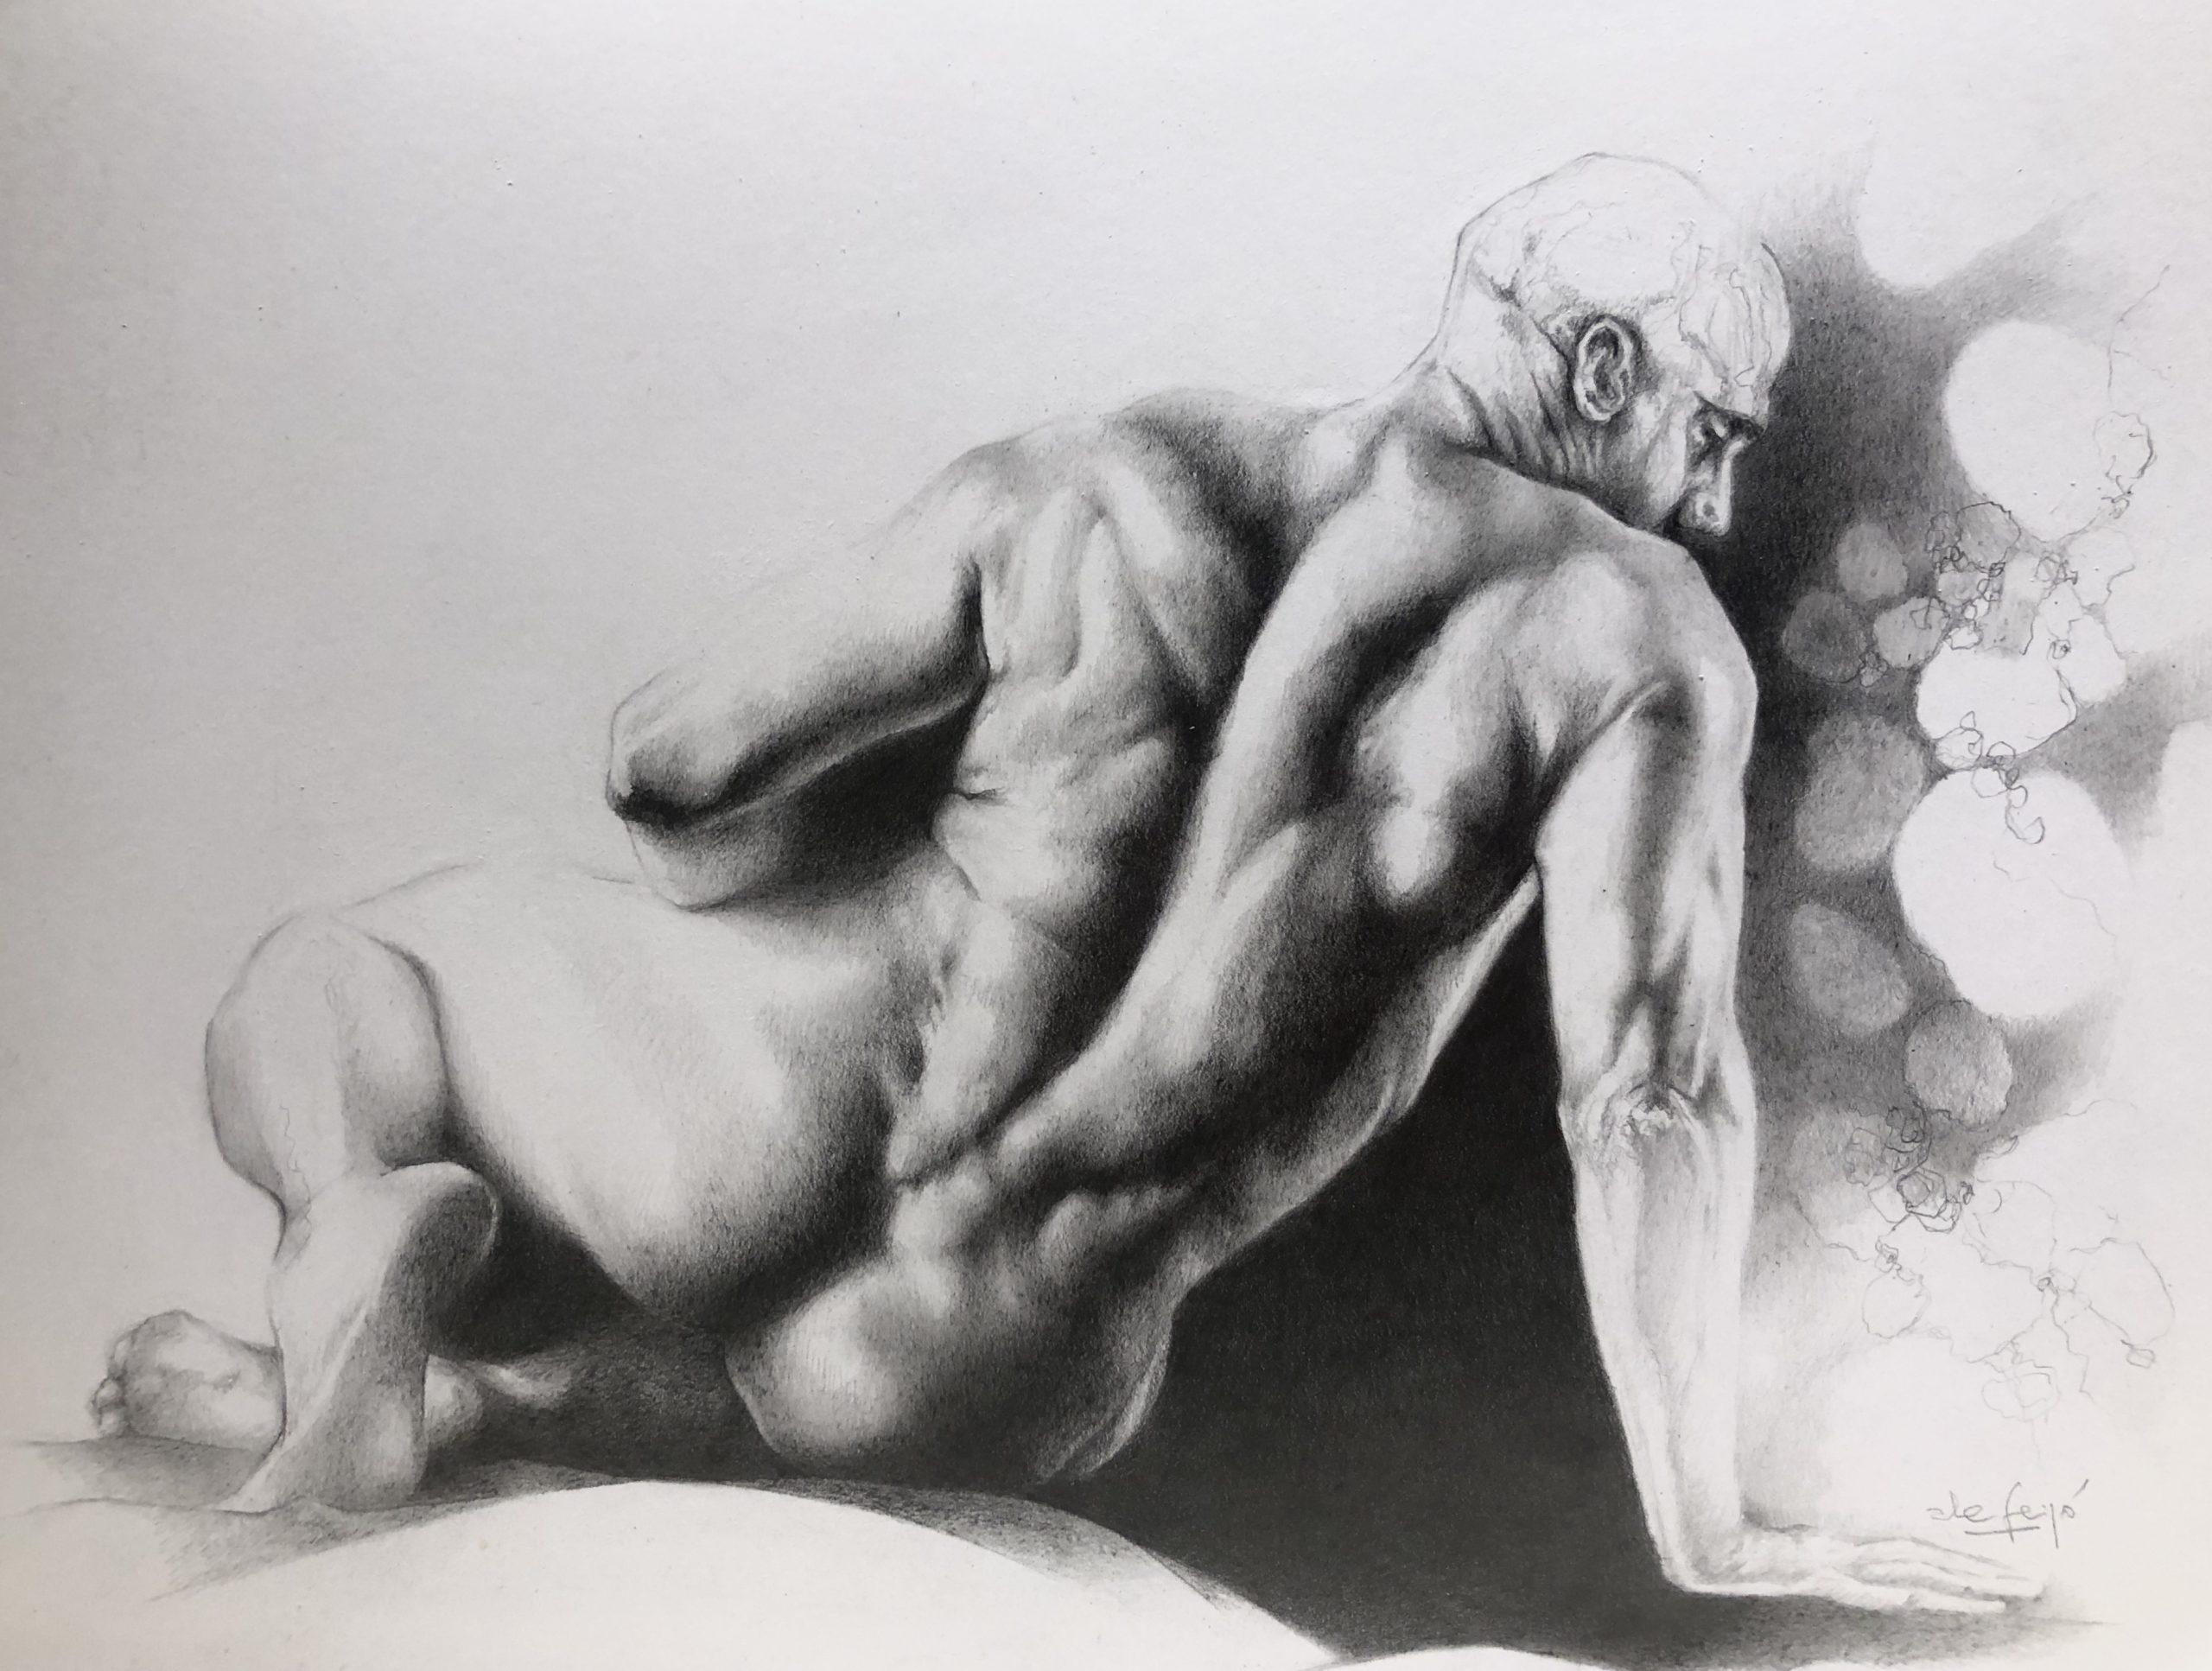 Ale Feijó | Serie Dibujar. Lápiz sobre papel. 21 x 29 cm